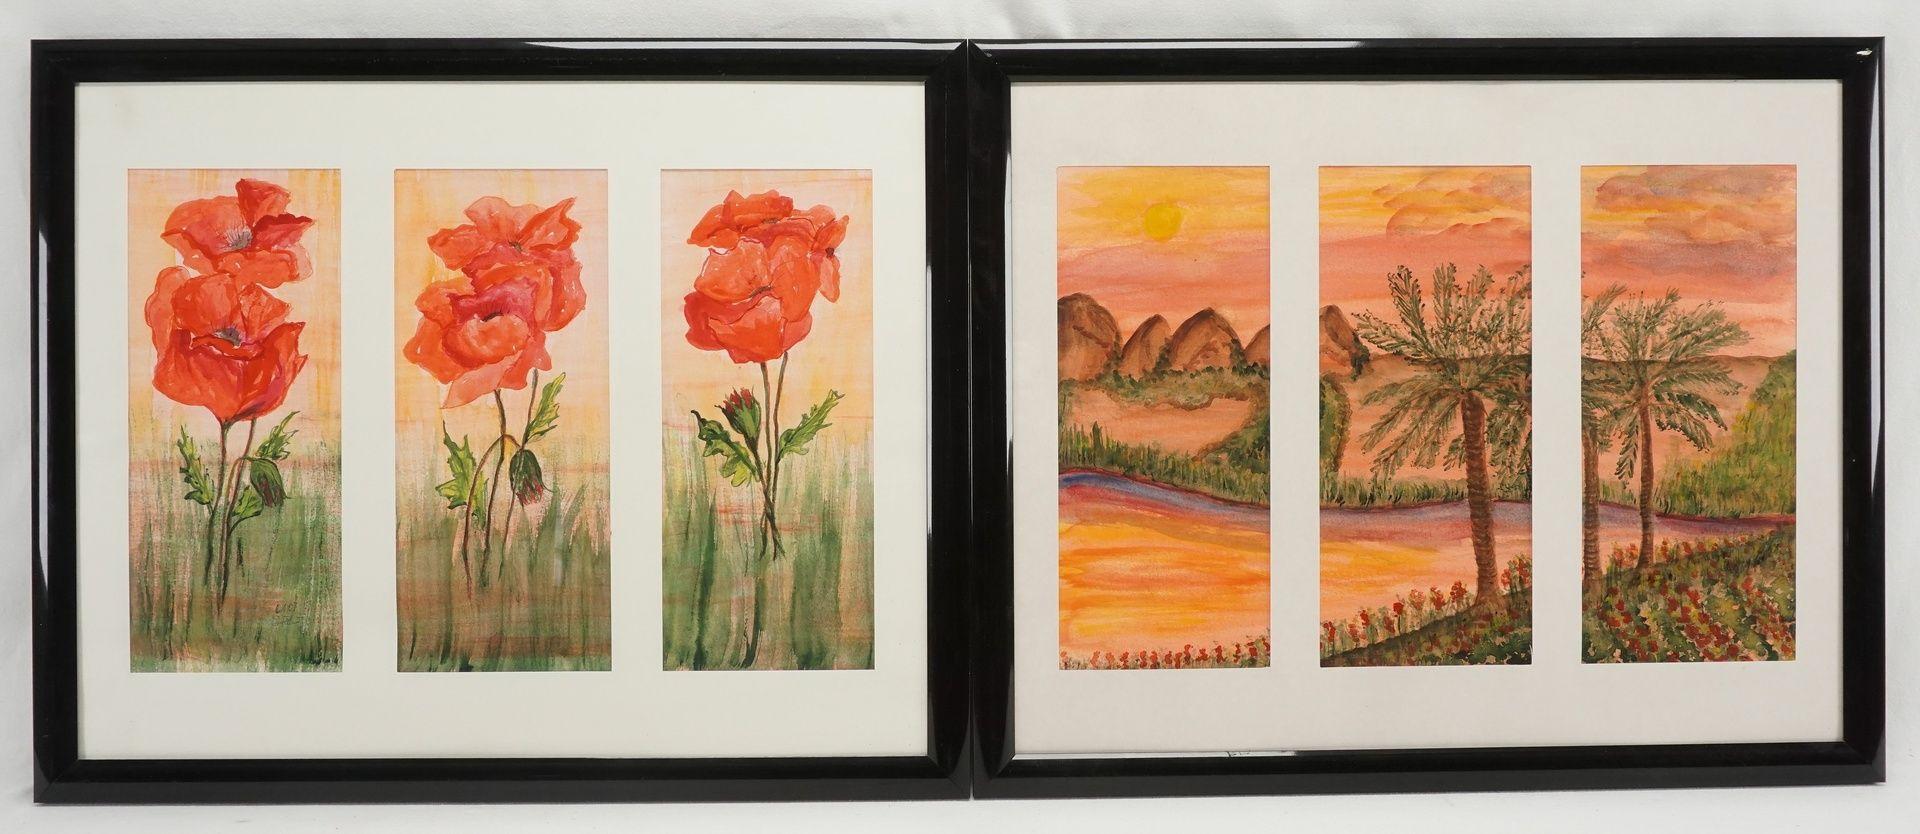 Ingetraut Fahnert, zwei Triptychon Aquarelle